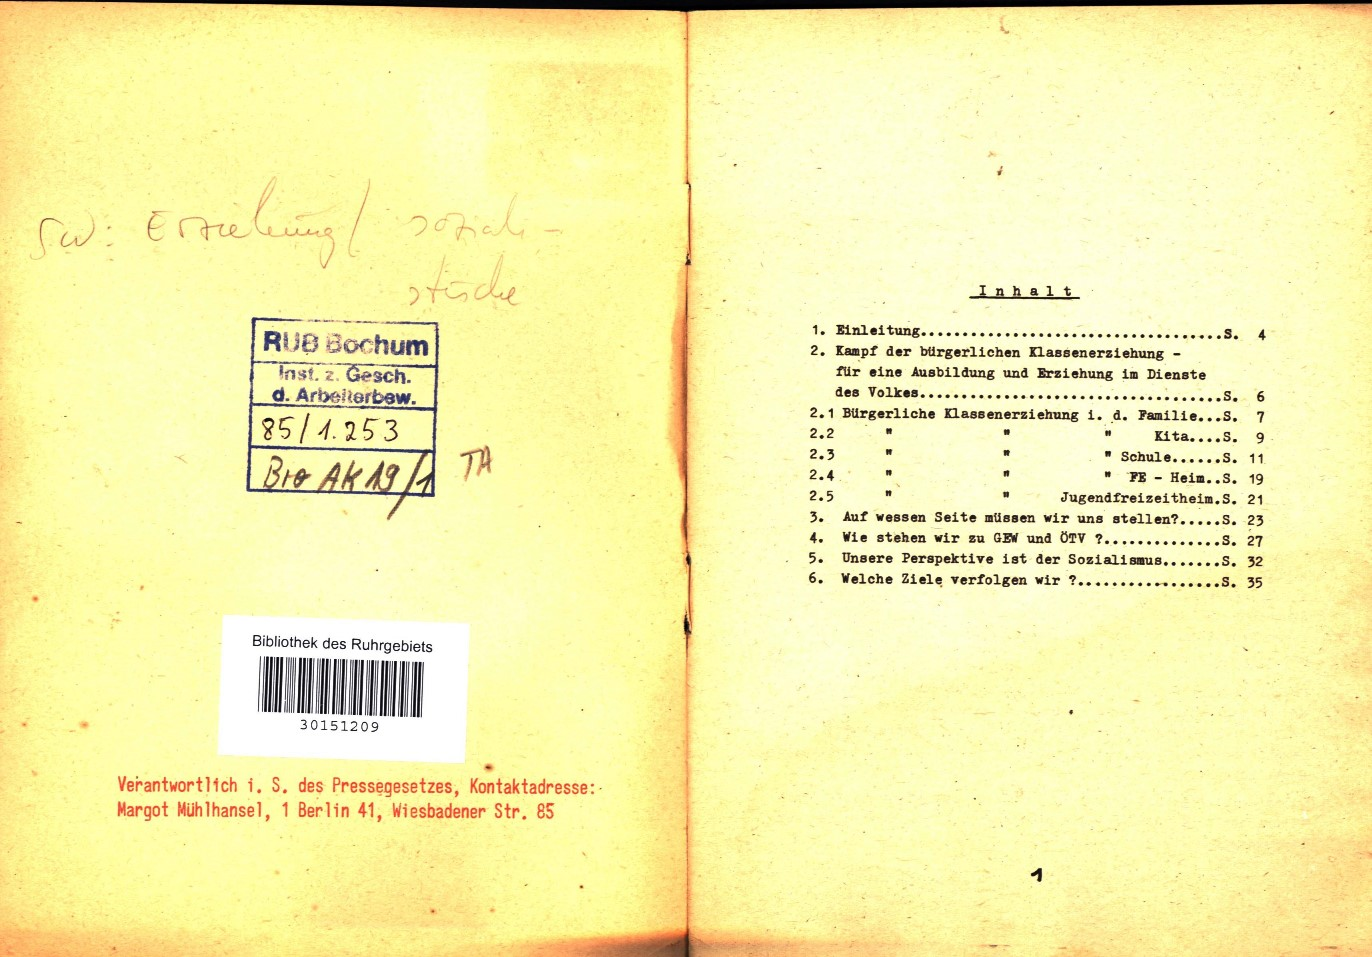 Berlin_BSLE_1975_Grundlagenpapier_02